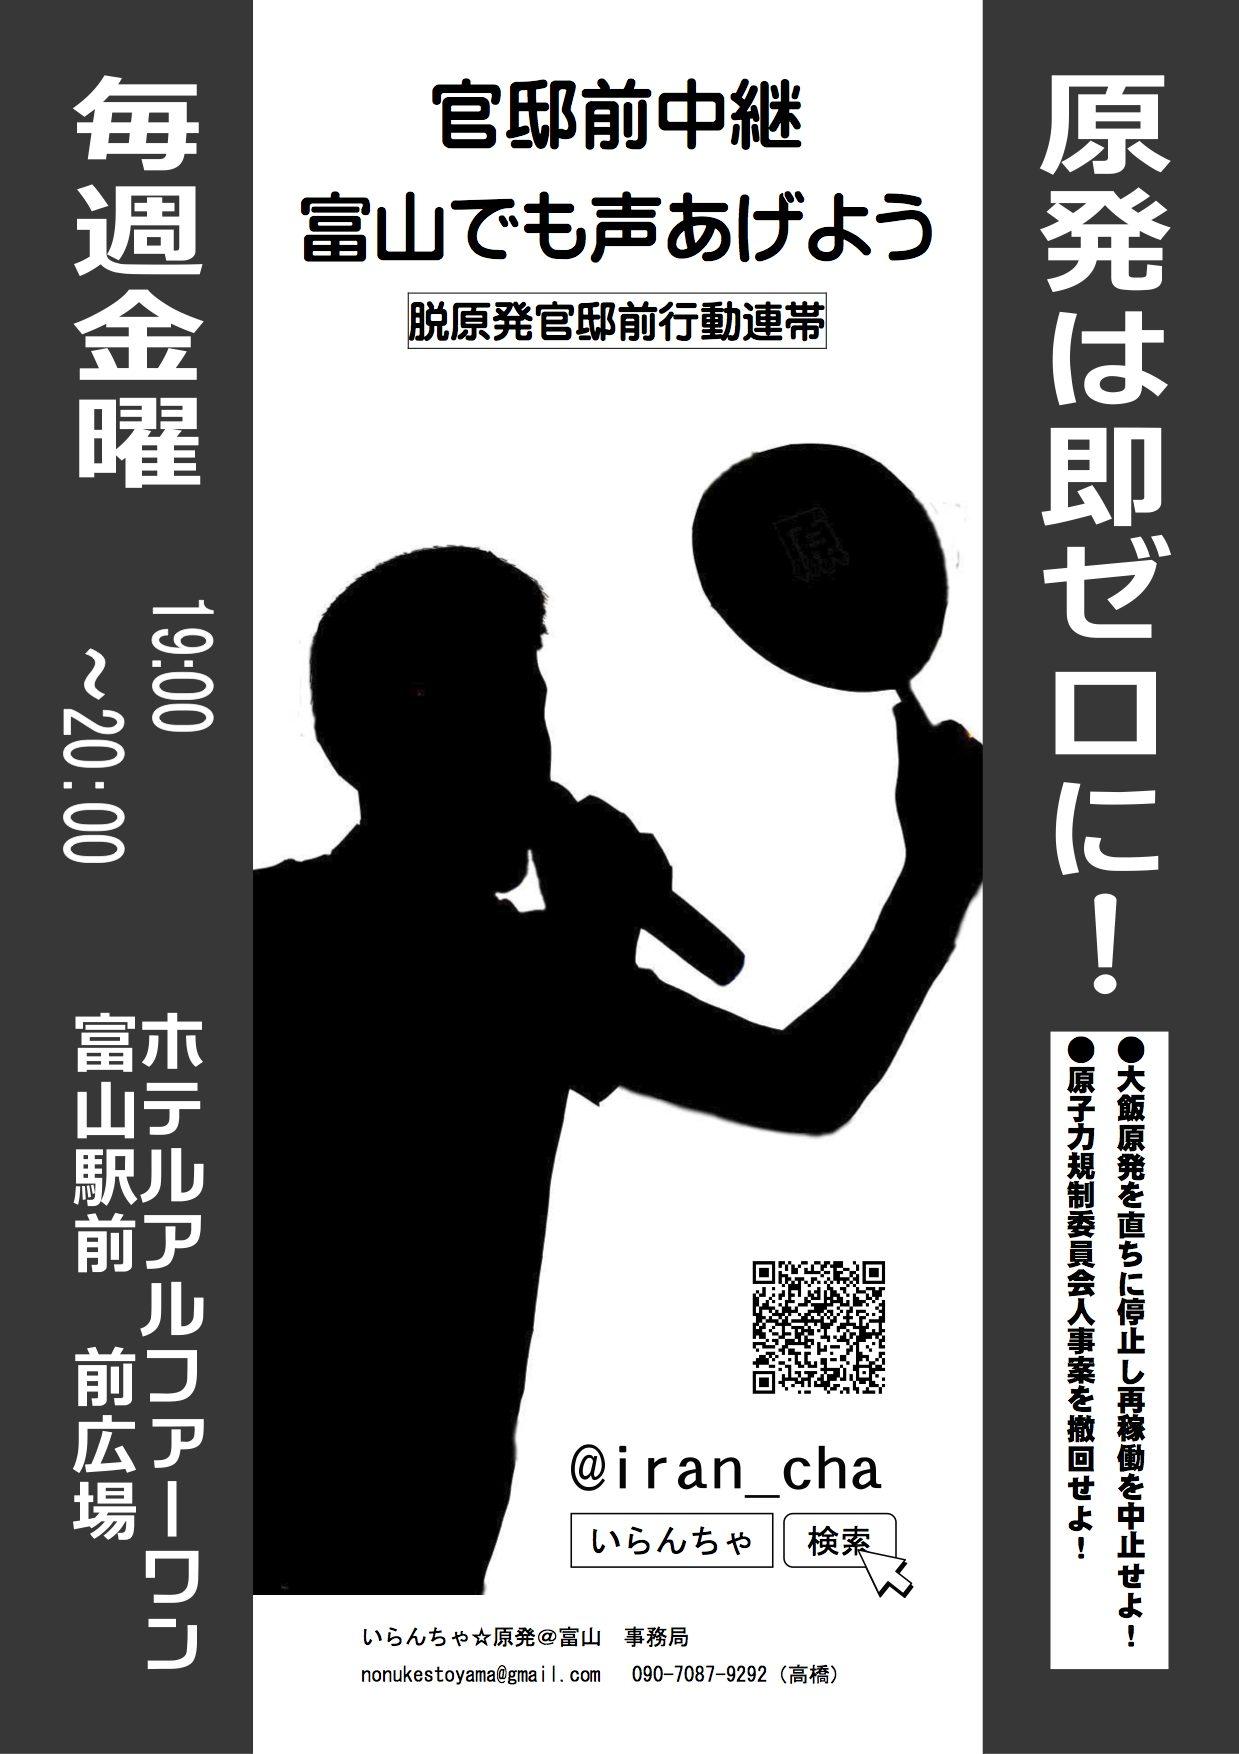 20120919作成金曜行動新ビラ